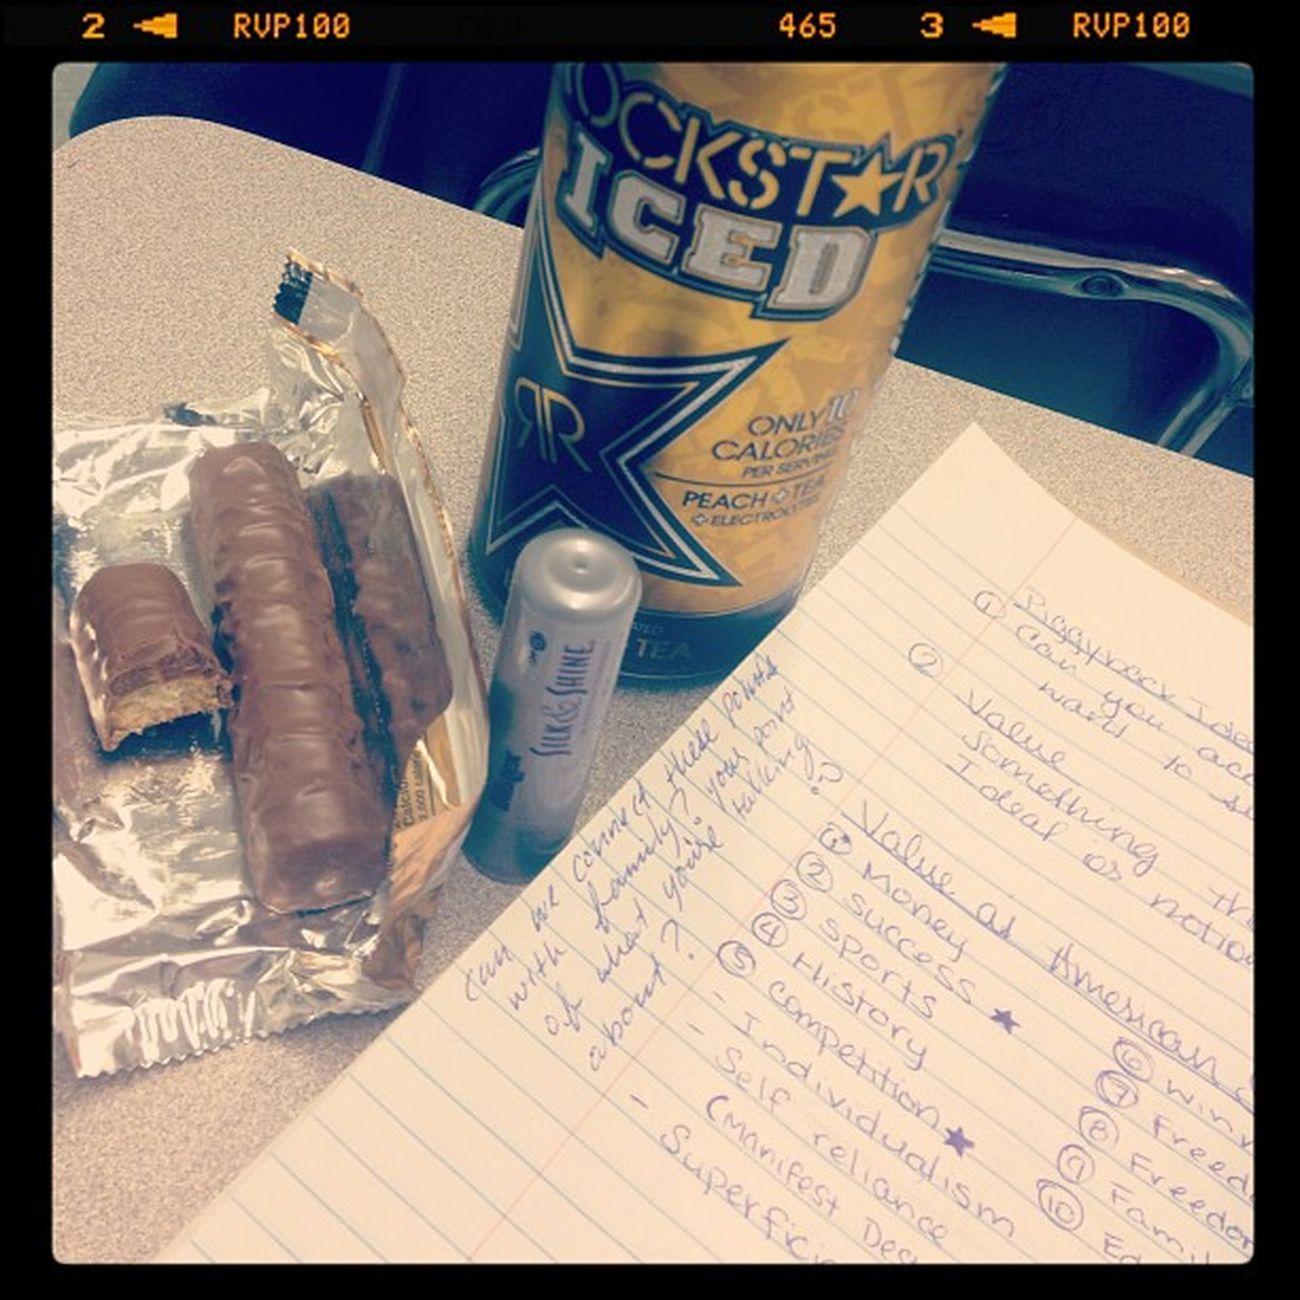 Student Twix Rockstar Blistex Notes Csun ImBored SpeechClass FaveChocolate CaffeineAddict